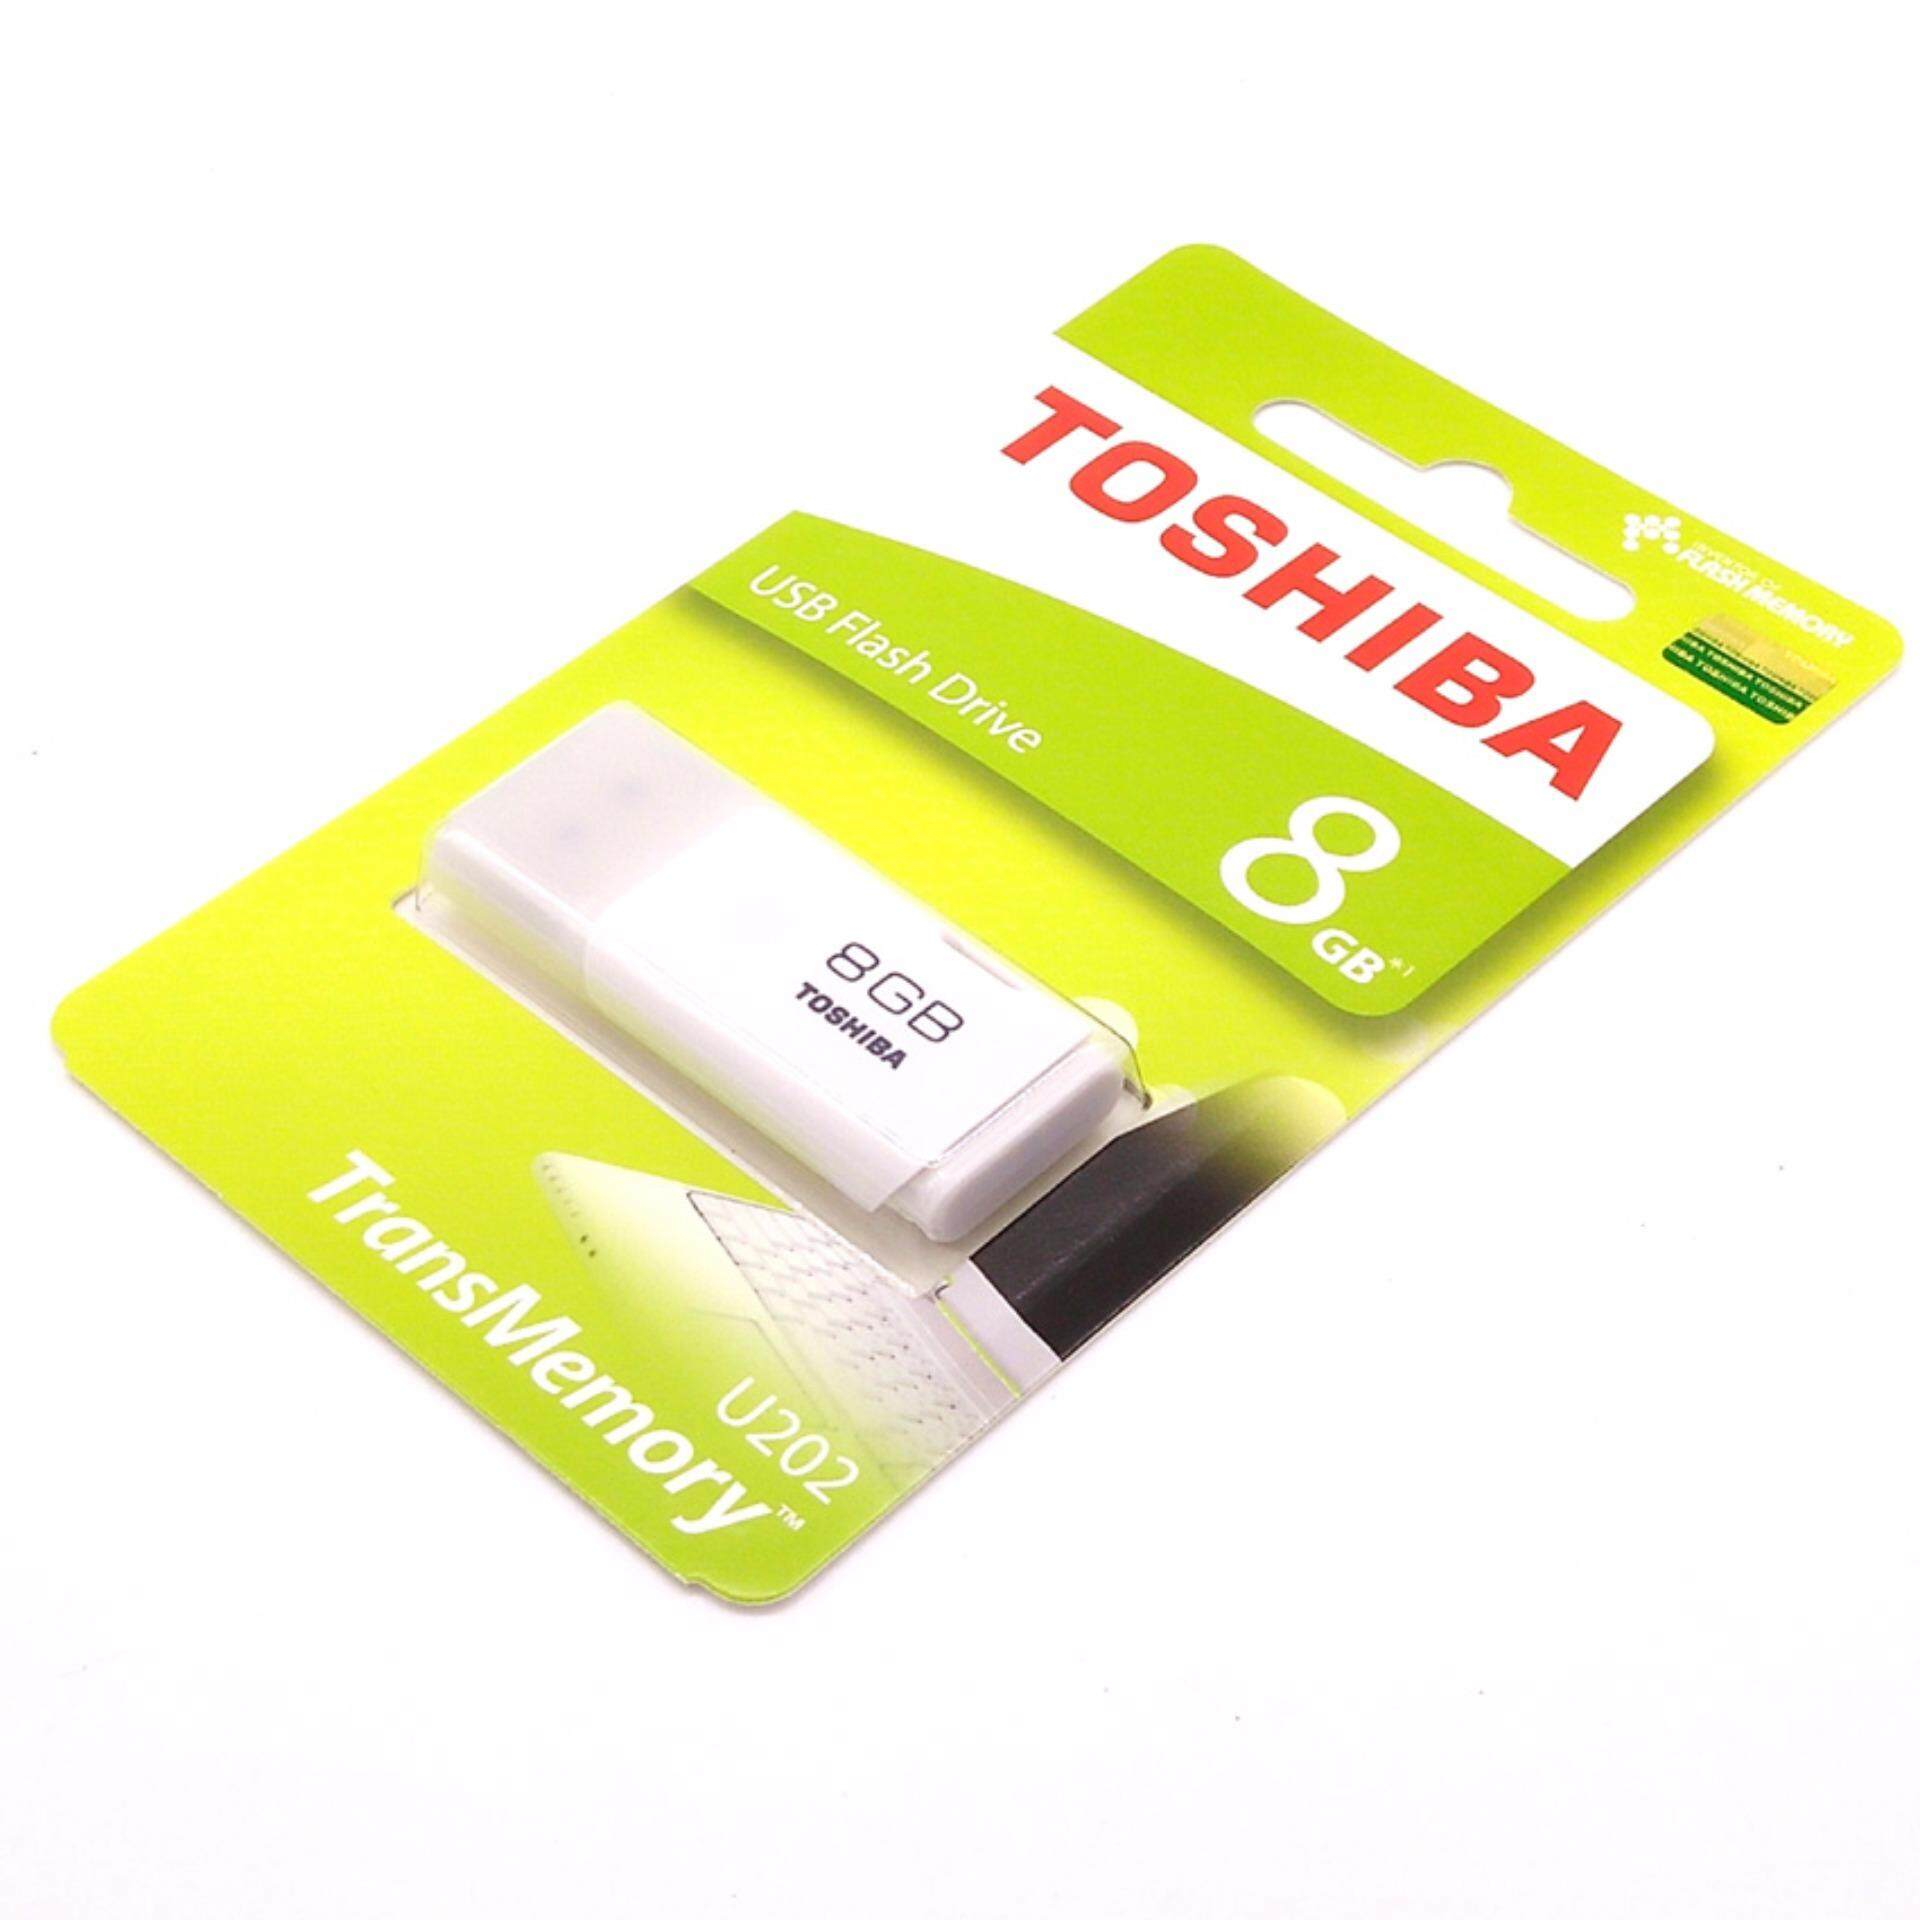 Official Toshiba U202 8GB USB PenDrive Flash Drive